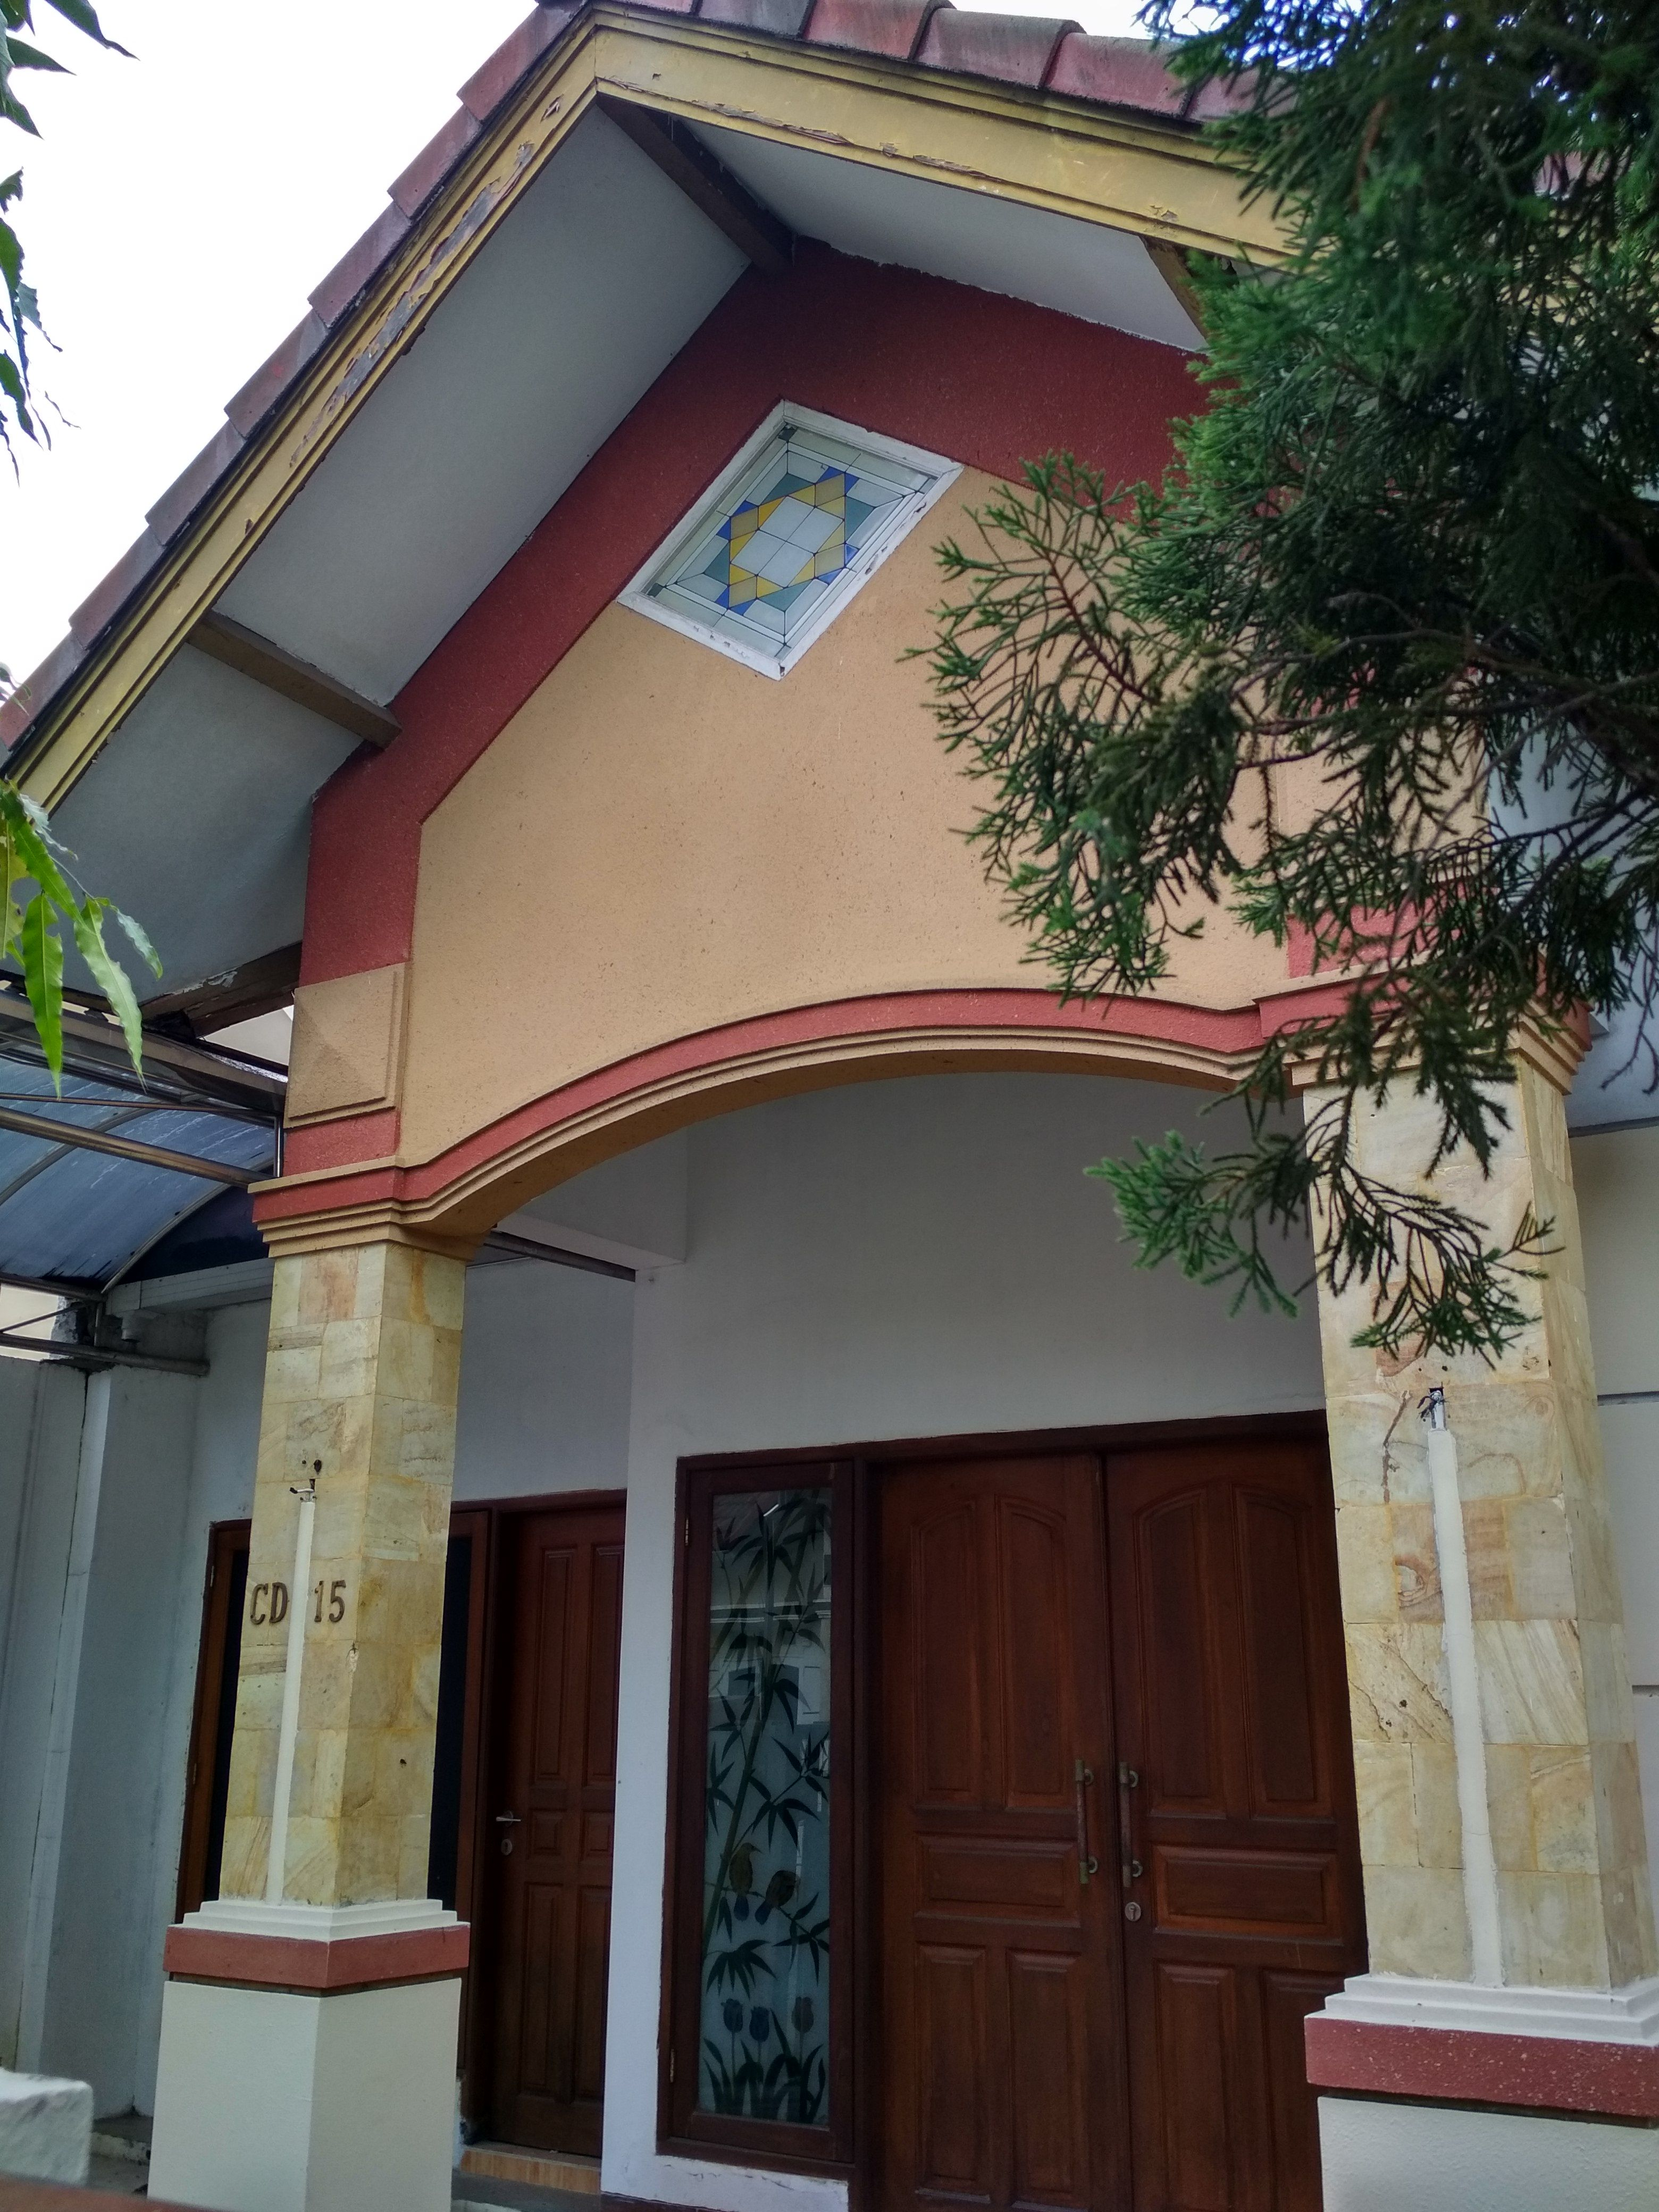 Rumah Minimalis Indah Dan Cantik Rumah Minimalis Indah Dan Asri